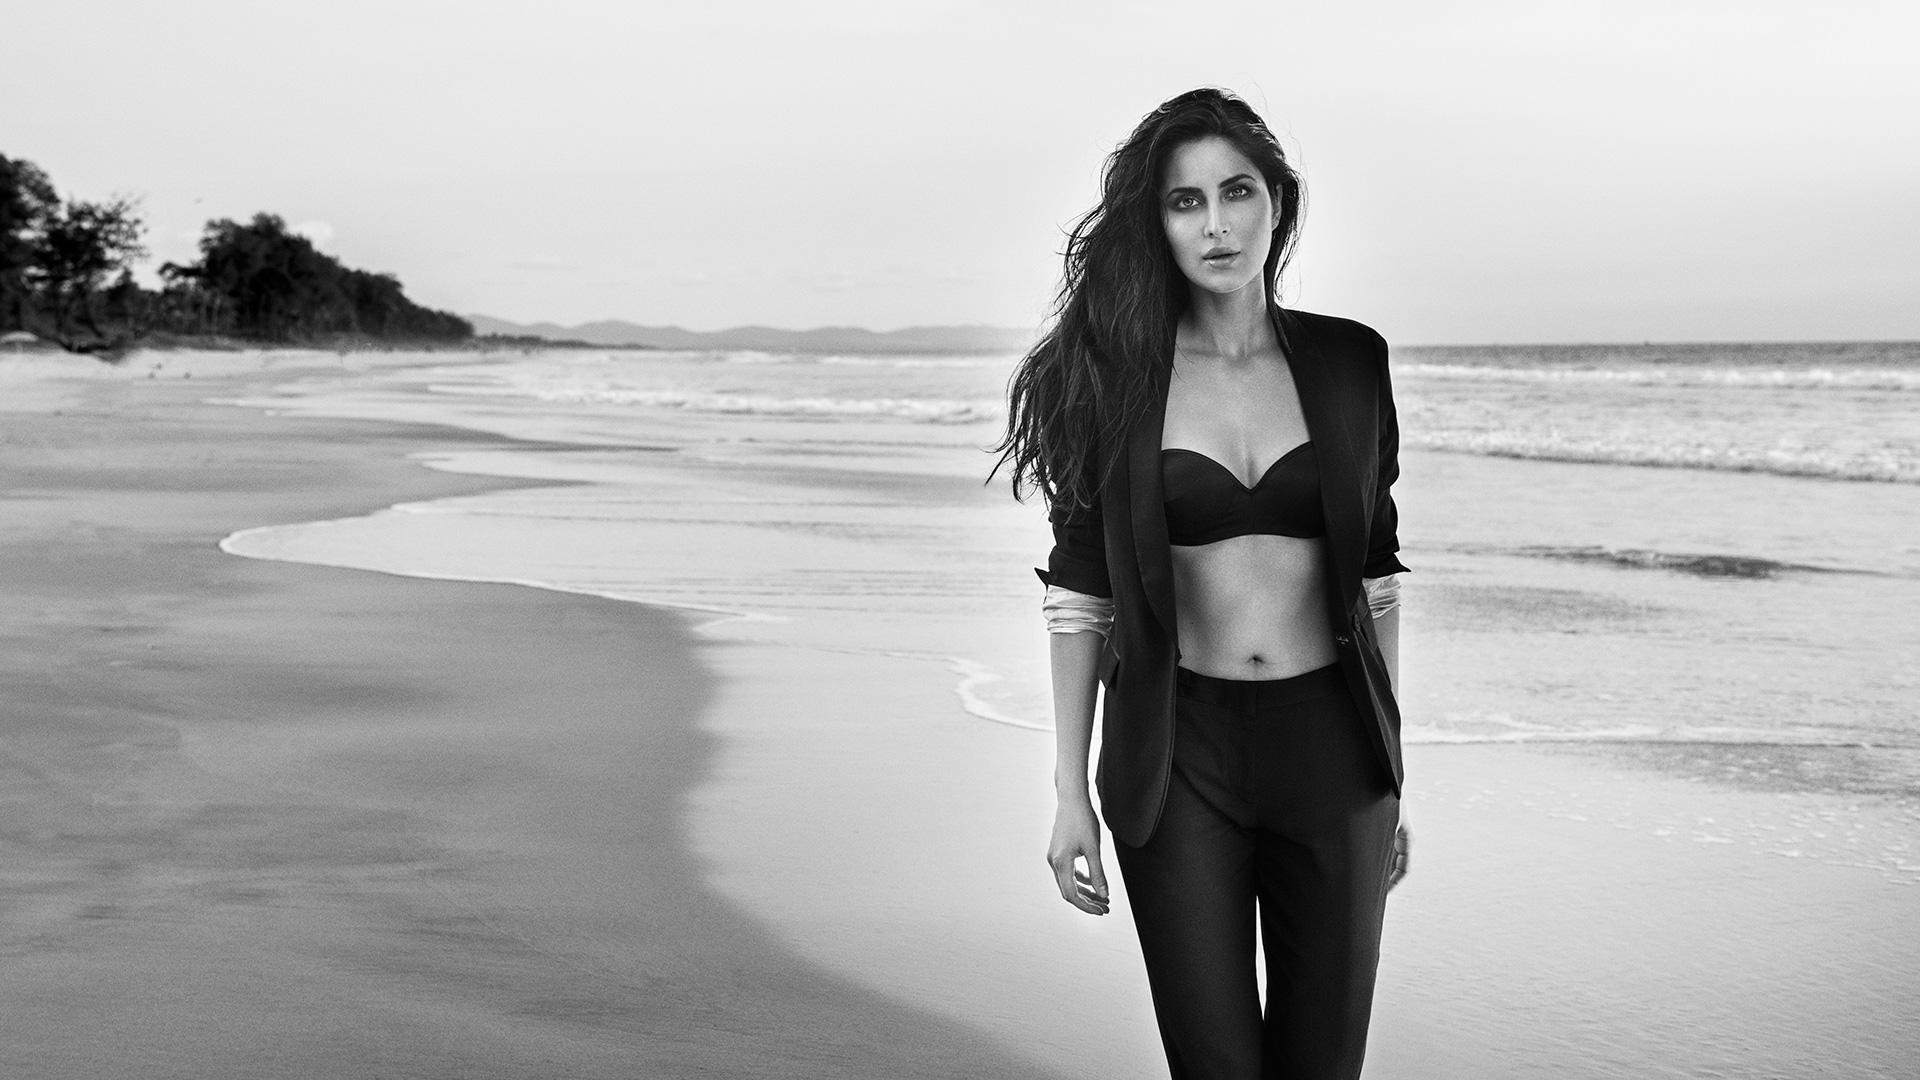 Katrina Kaif Monochrome HD, HD Indian Celebrities, 4k